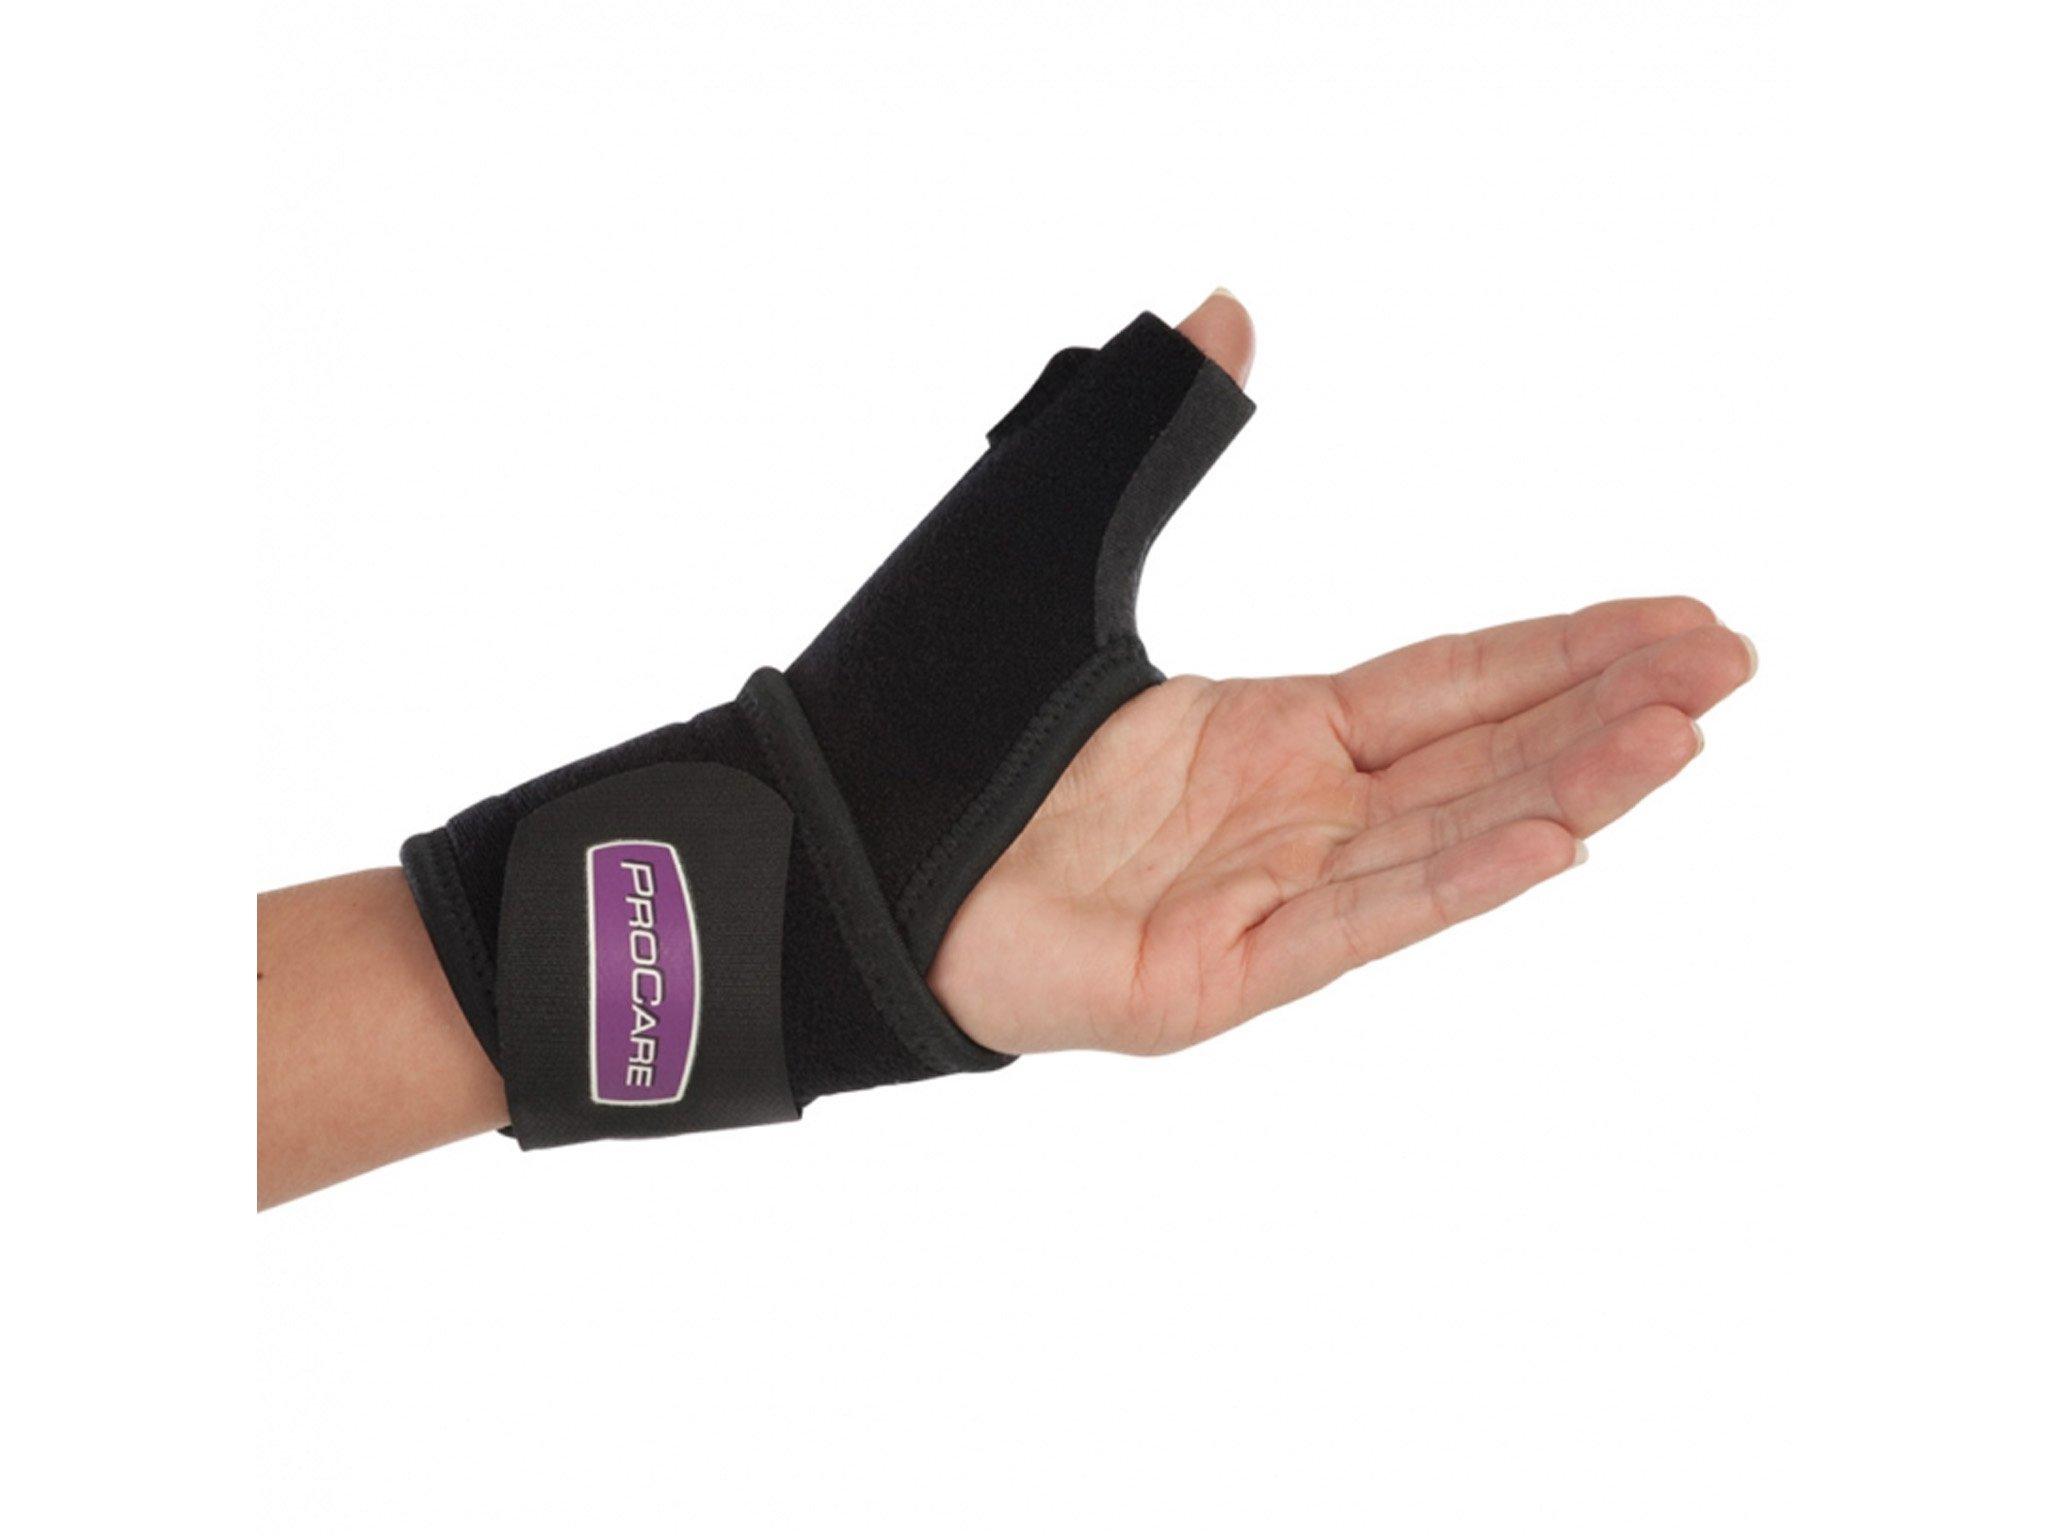 DONJOY procare universal Thumb-O-Prene™